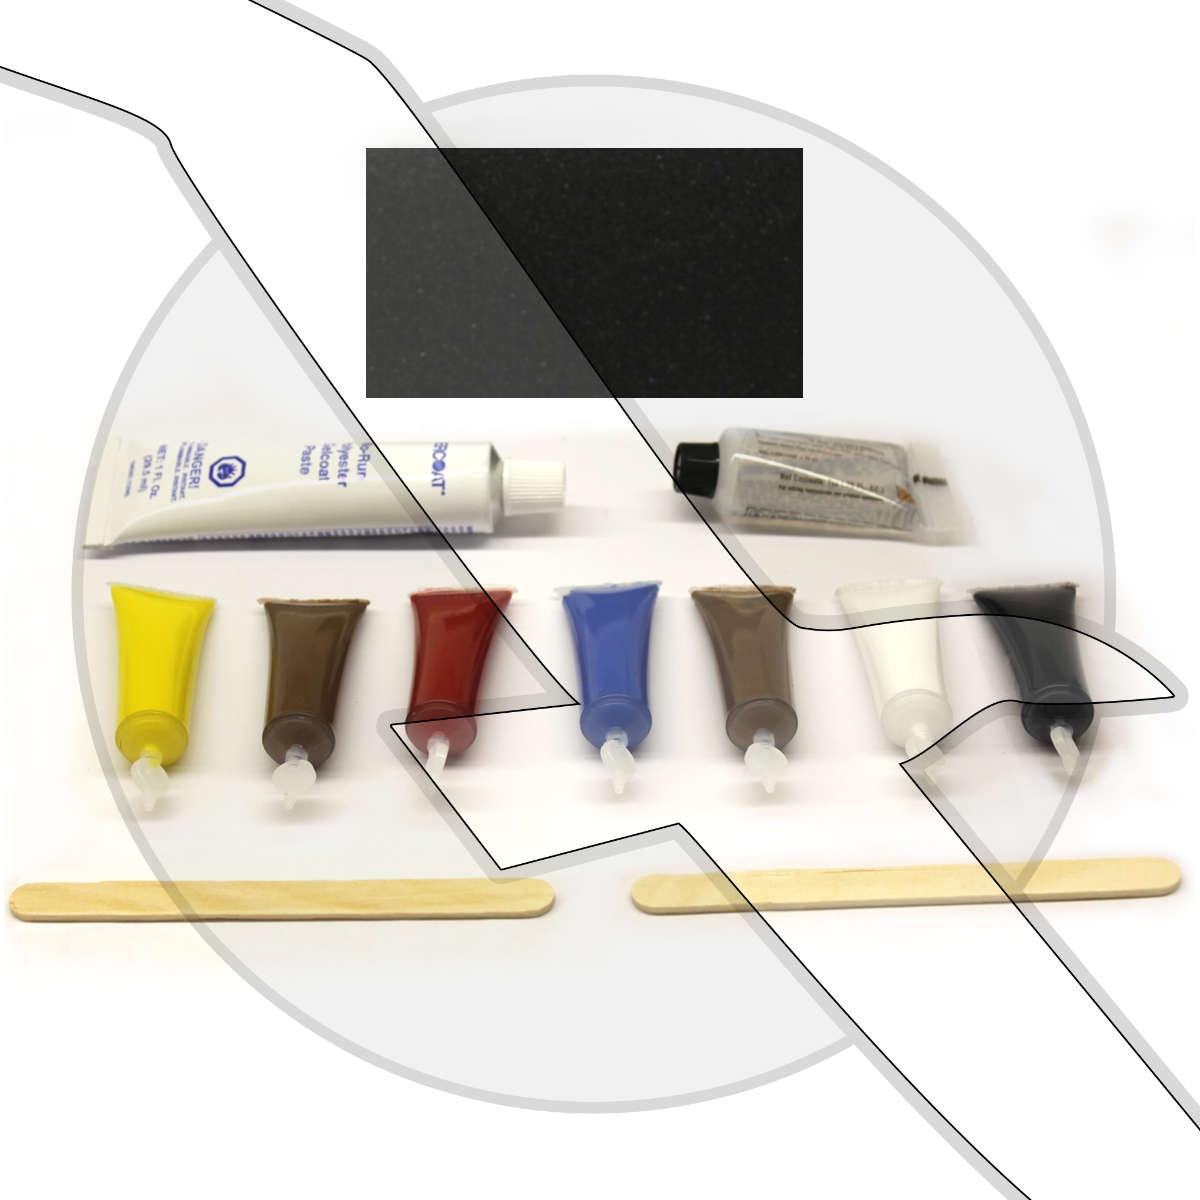 Evercoat Fiberglass Gelcoat Paint Scratch Repair Kit